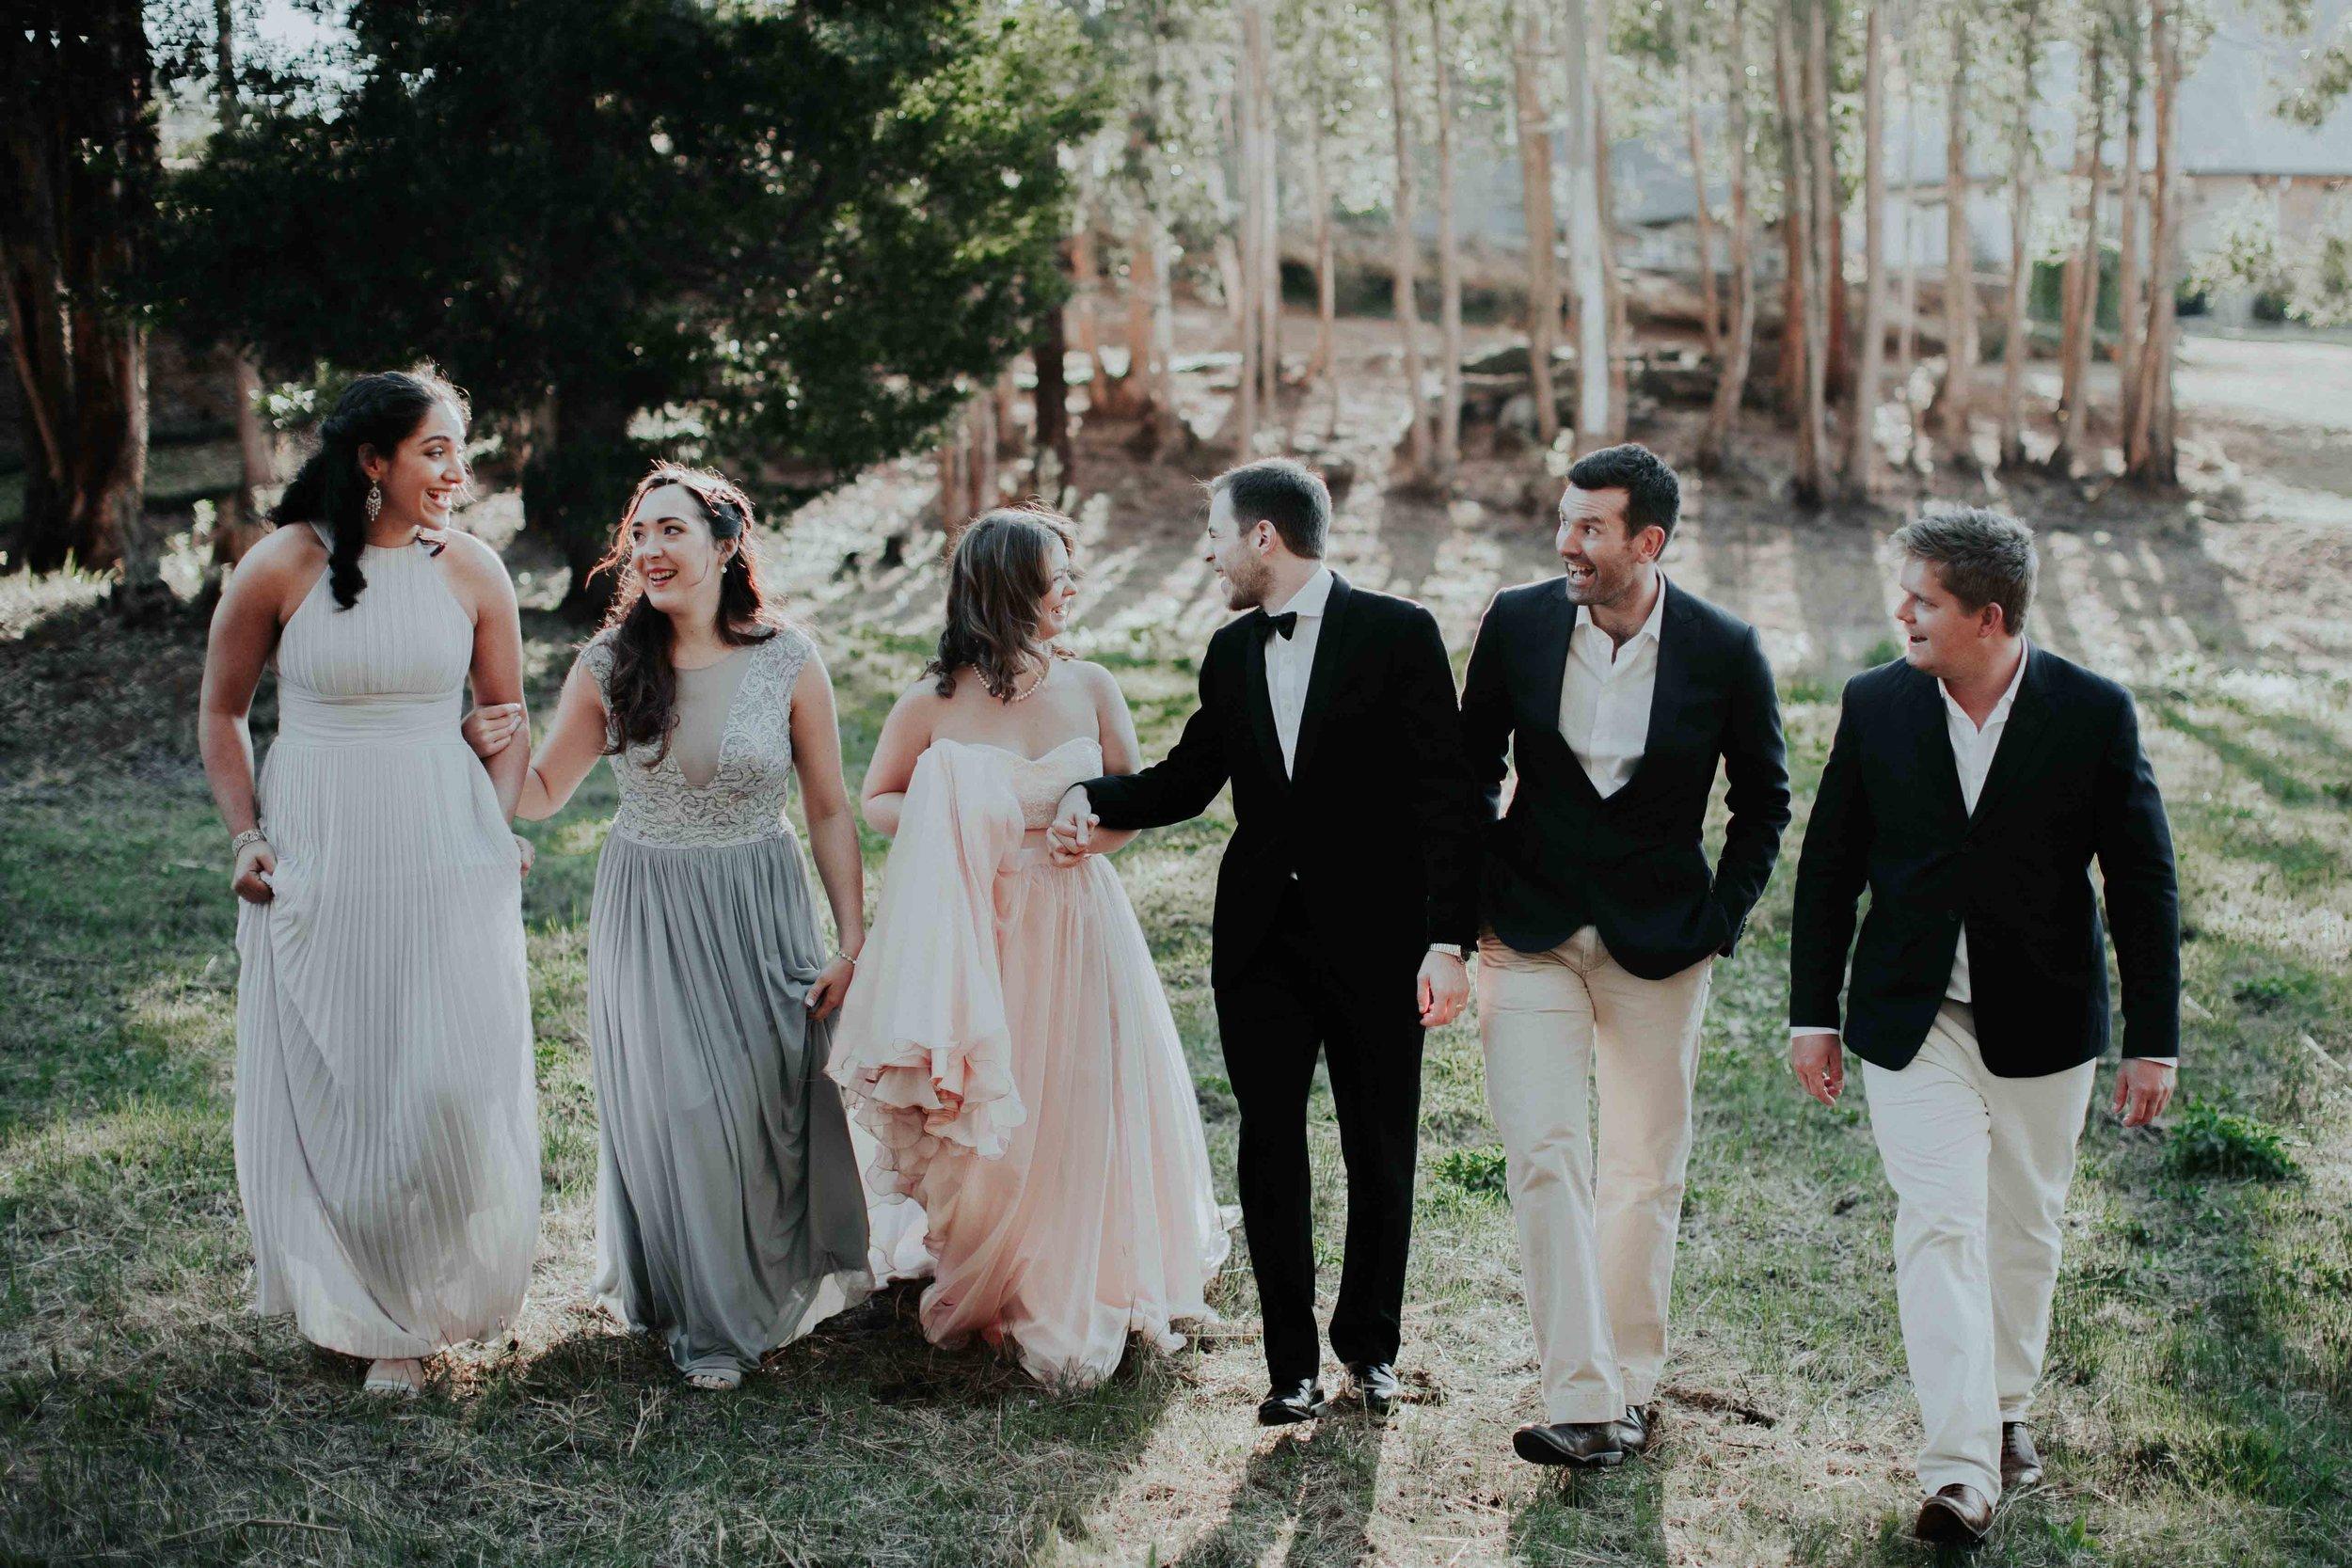 Kristi Smith Photography - Wedding Photography - Darryl & Meg 19.jpg